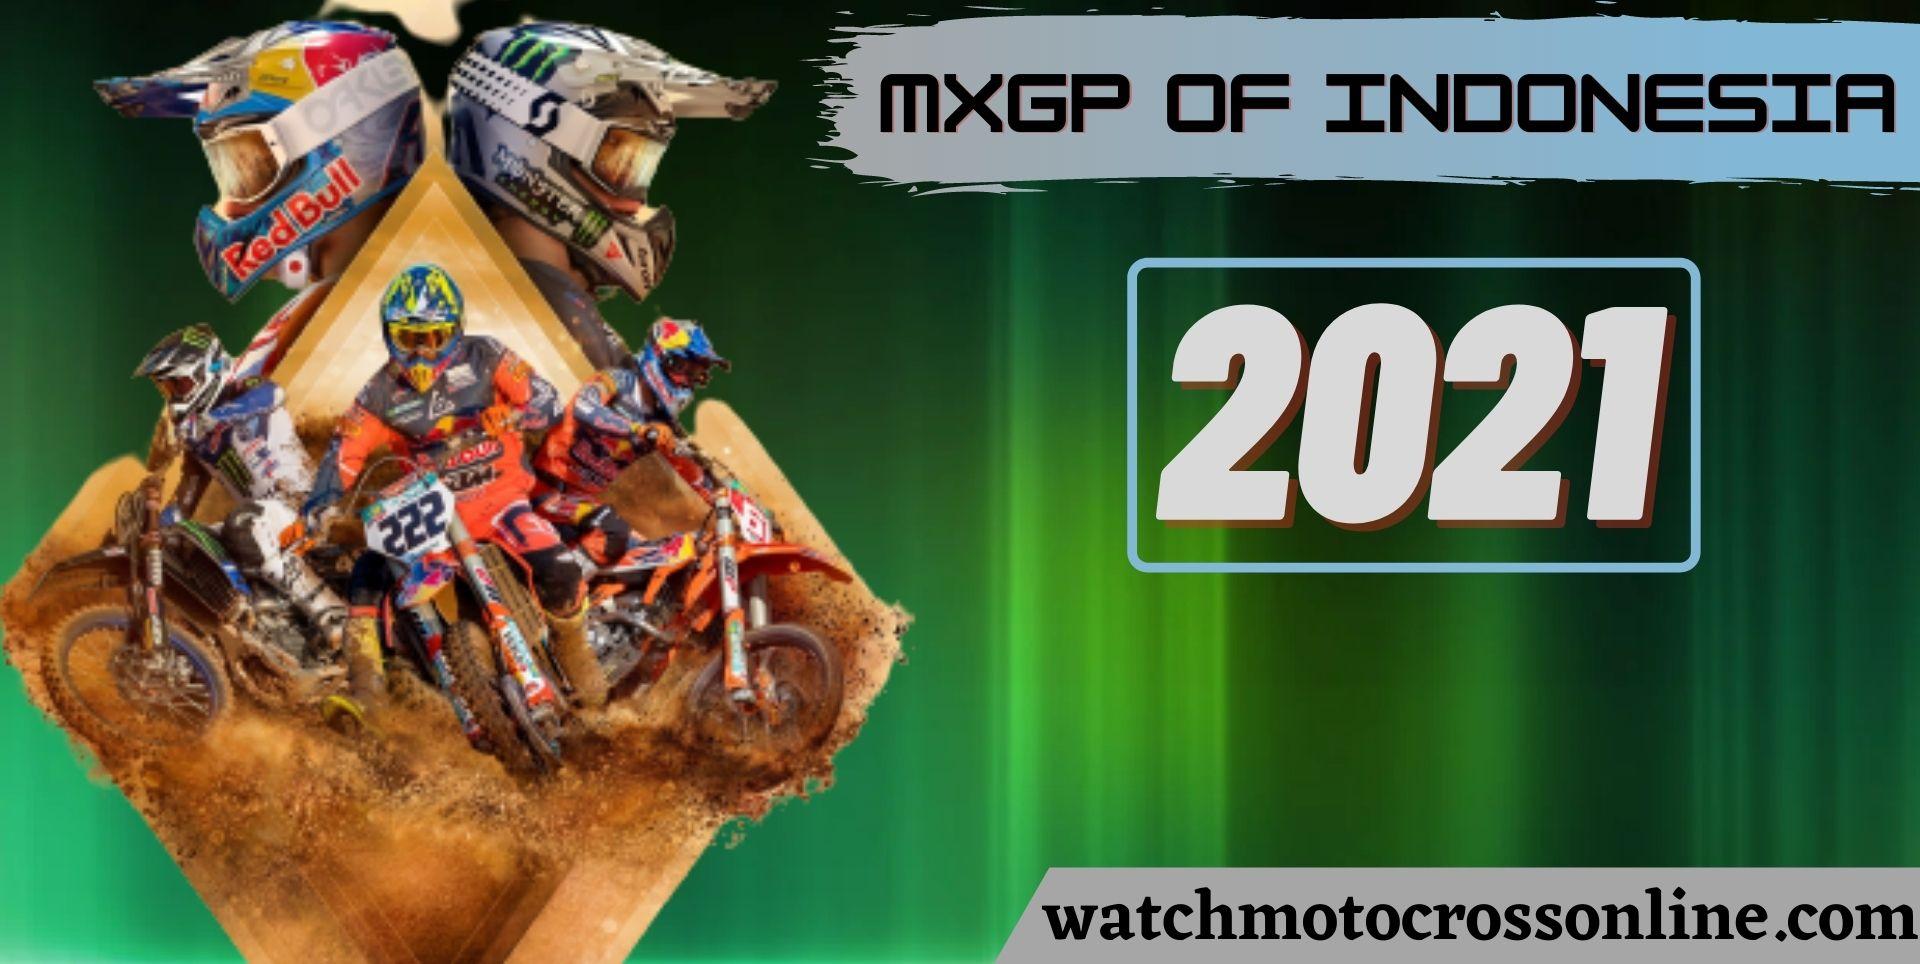 MXGP Of Indonesia Live Stream 2021